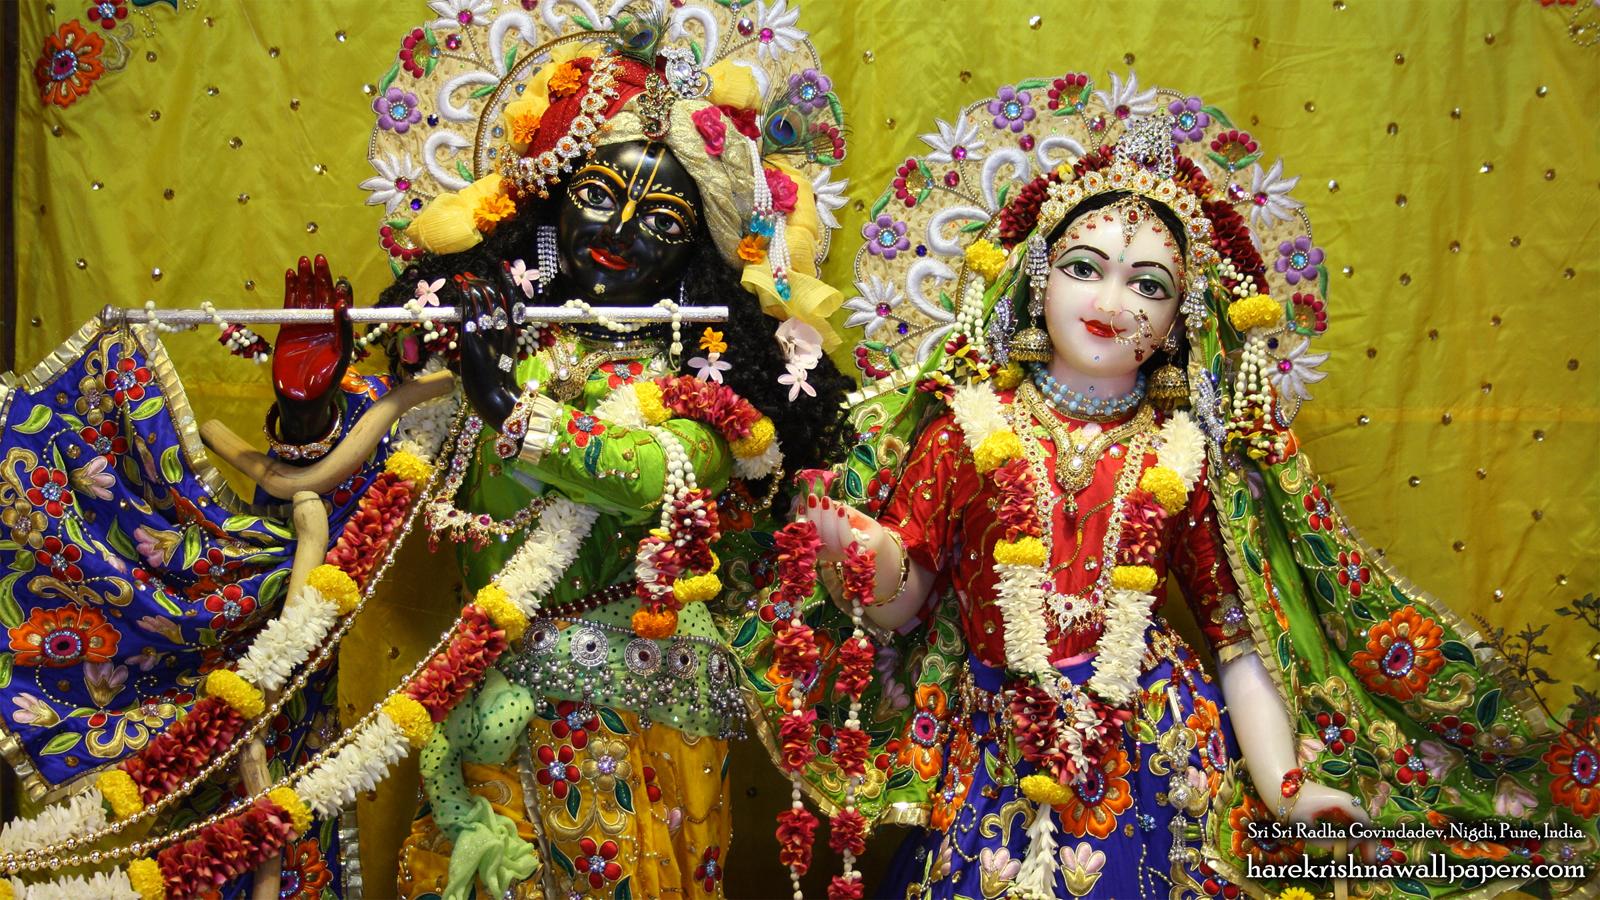 Sri Sri Radha Govind Close up Wallpaper (008) Size 1600x900 Download